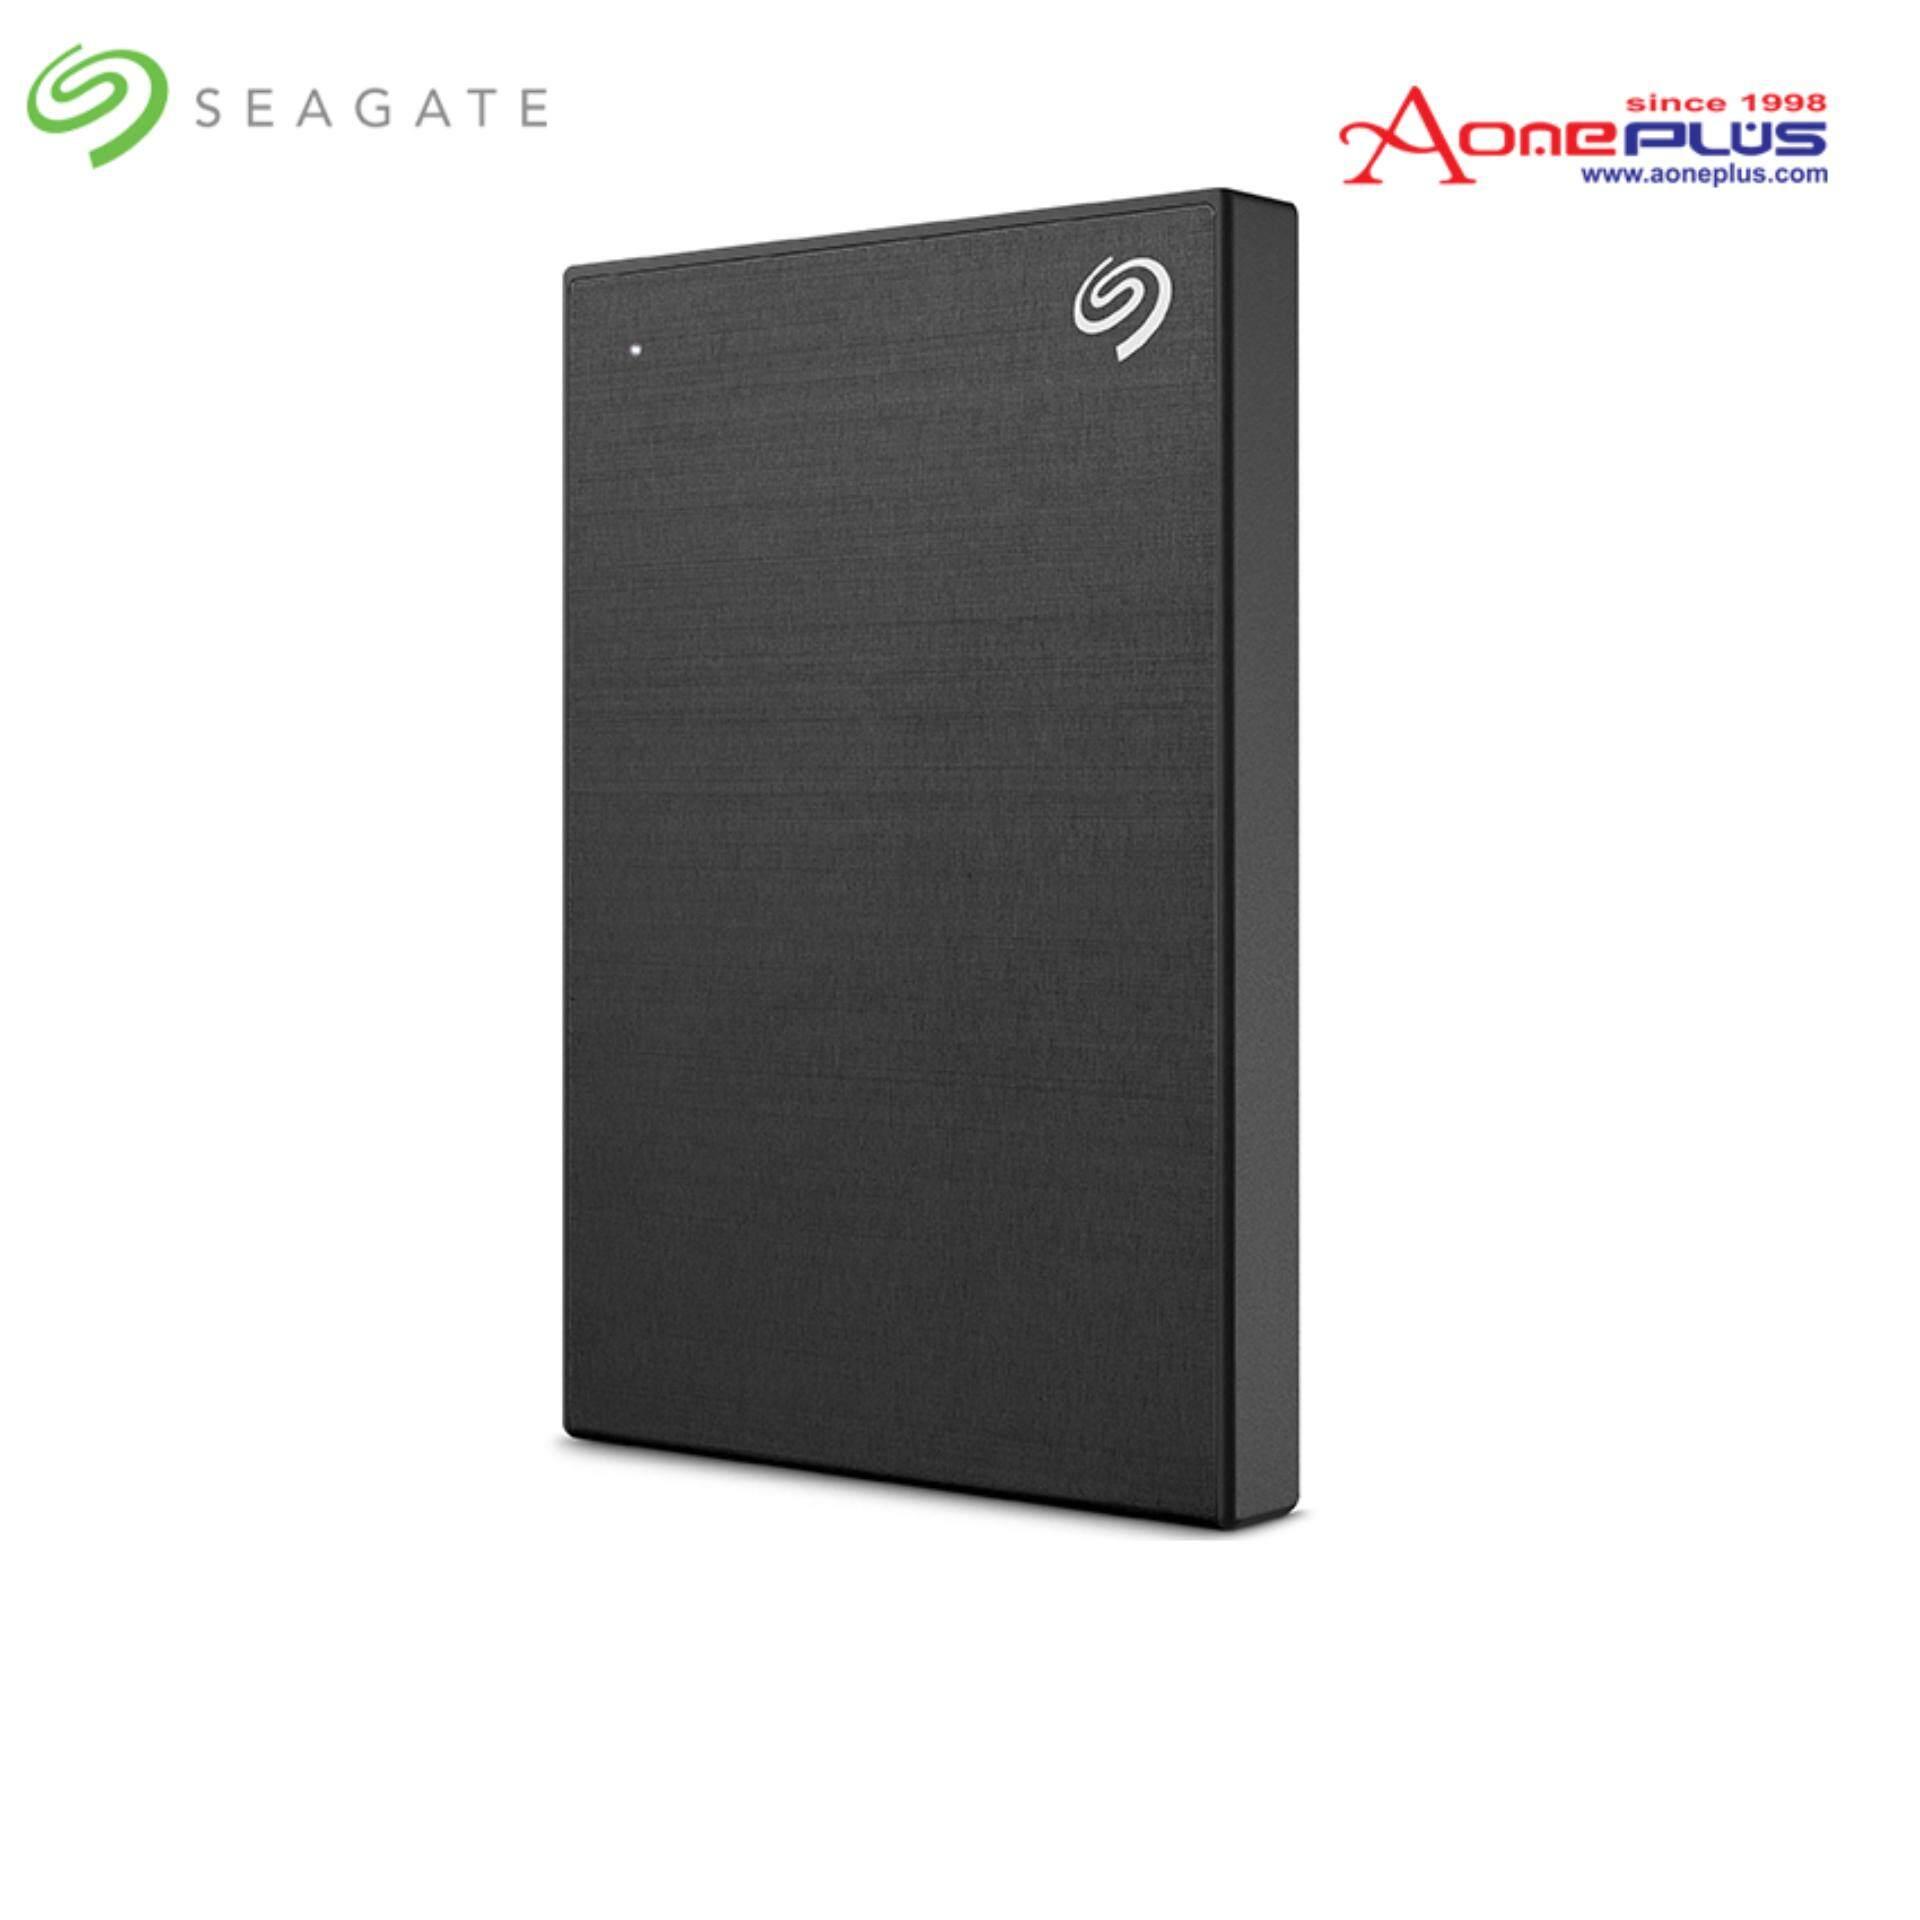 Seagate  1 TB Backup Plus Portable Drive  ( STHN1000400 / STHN1000401 / STHN1000402 / STHN1000403 / STHN1000404 / STHN1000405 )